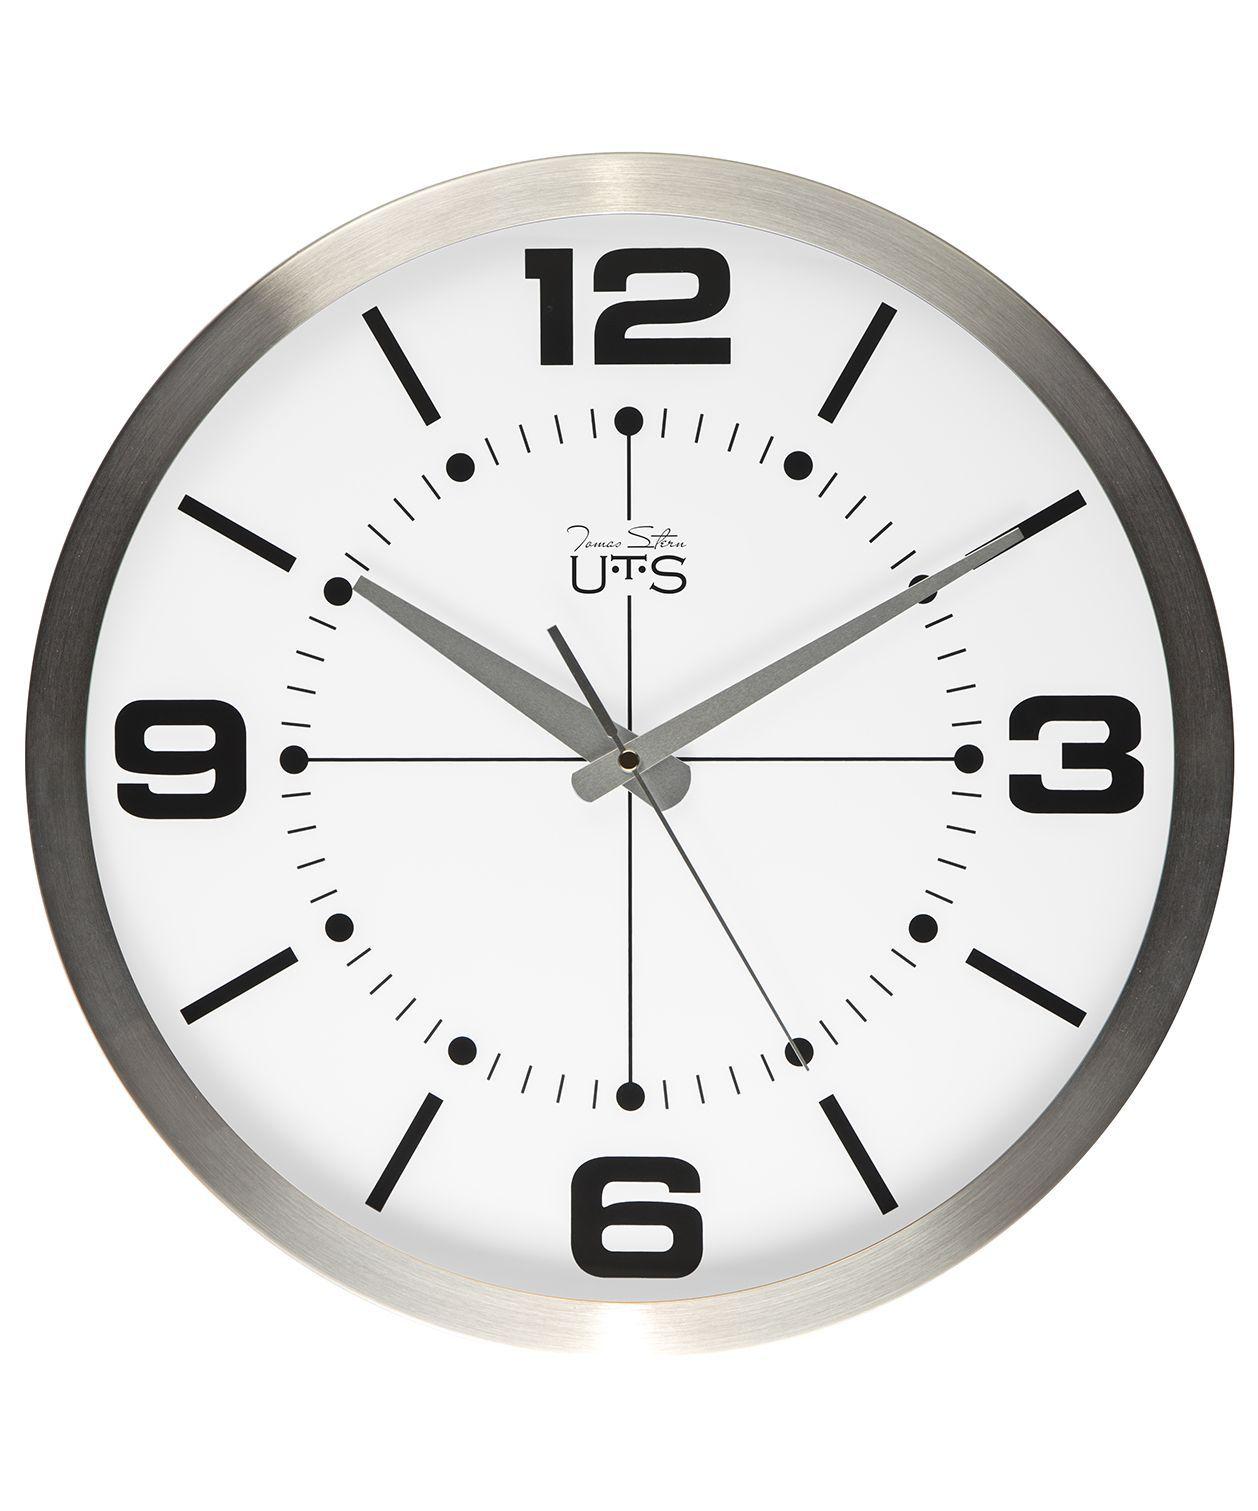 Часы настенные Часы настенные Tomas Stern 9020 chasy-nastennye-tomas-stern-9020-germaniya.jpg